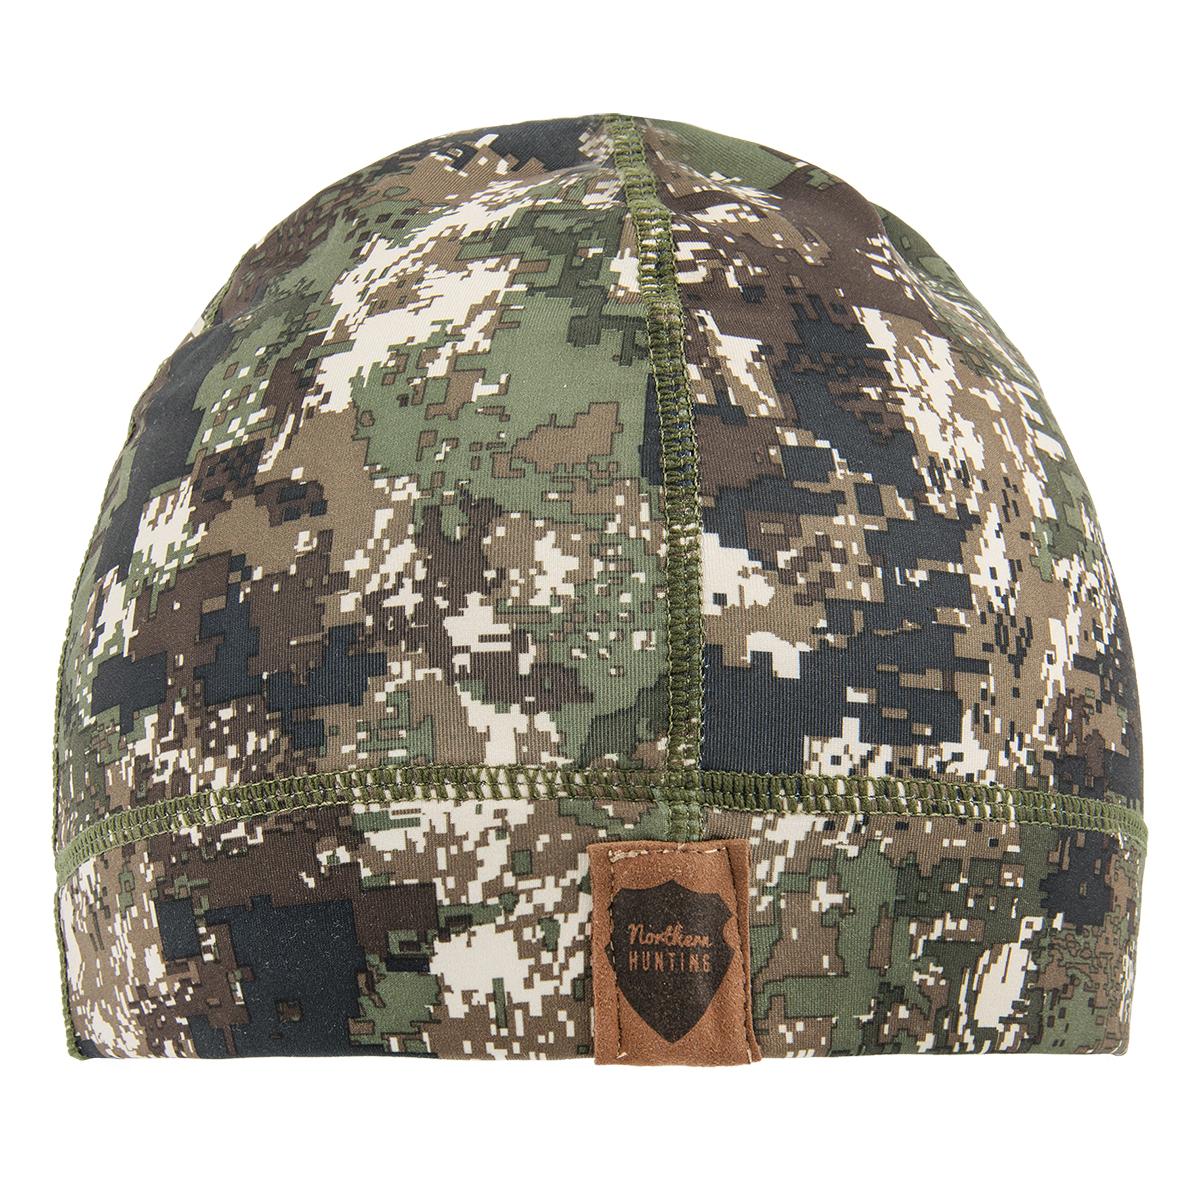 Northern Hunting Camo-Mütze Trand im Pareyshop